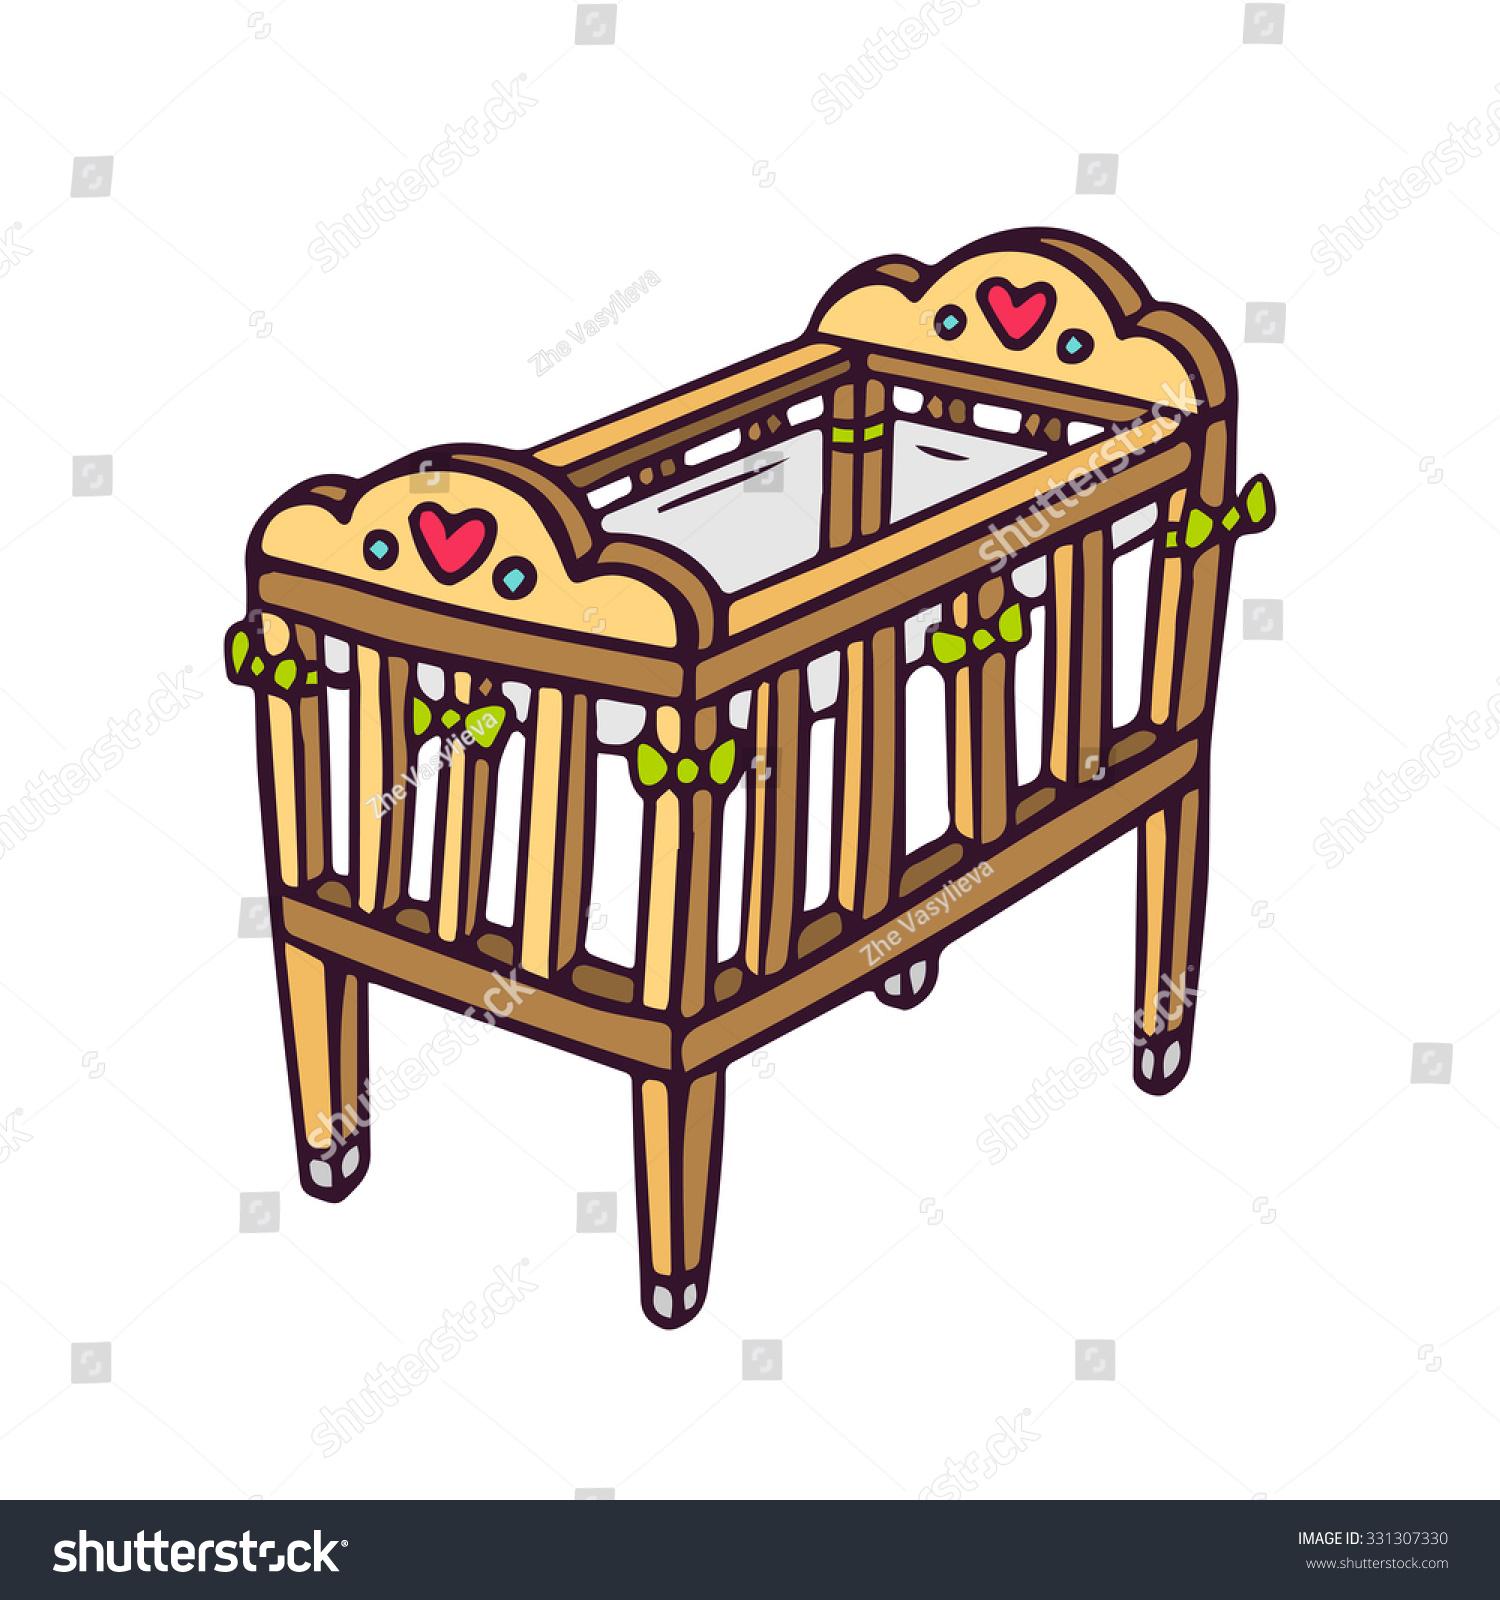 clipart baby cradle - photo #20